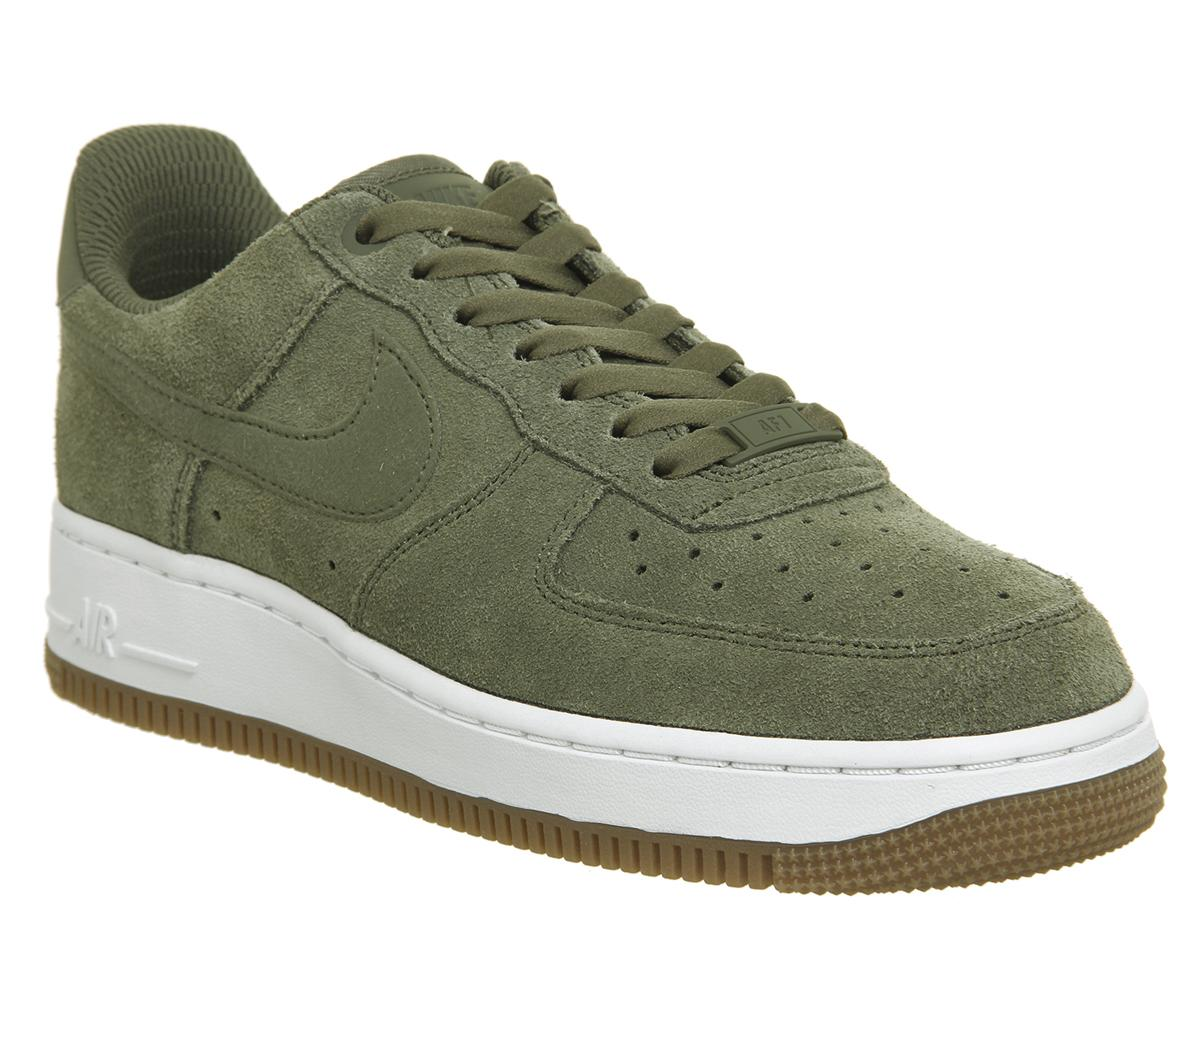 Nike Air Force 1 07 Trainers Medium